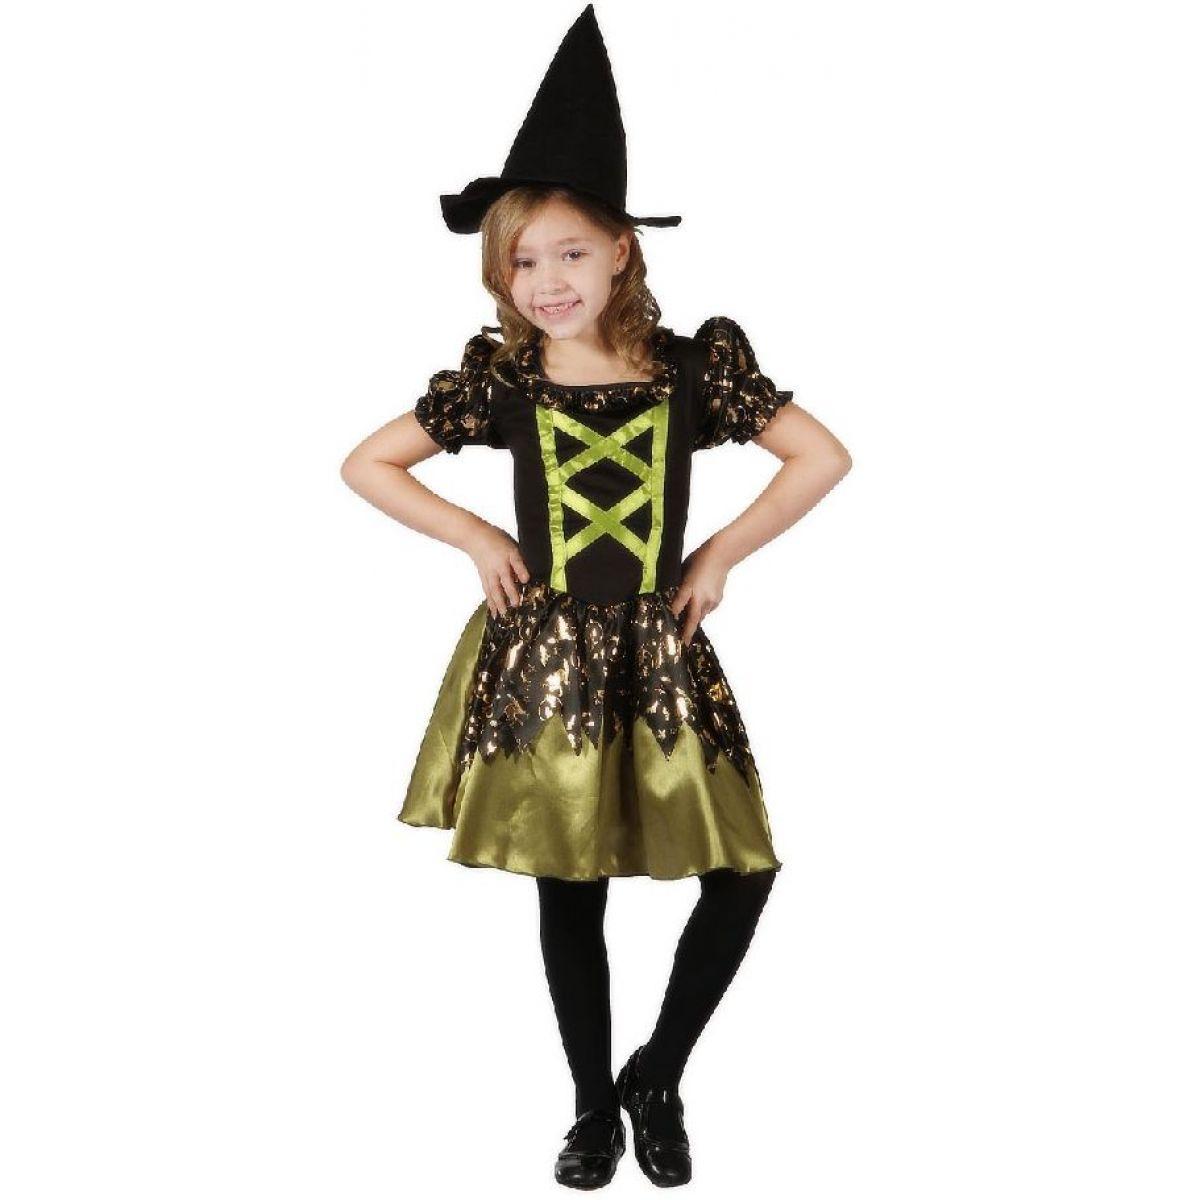 Made Dětský kostým Čarodějka zelená 120-130 cm MaDe